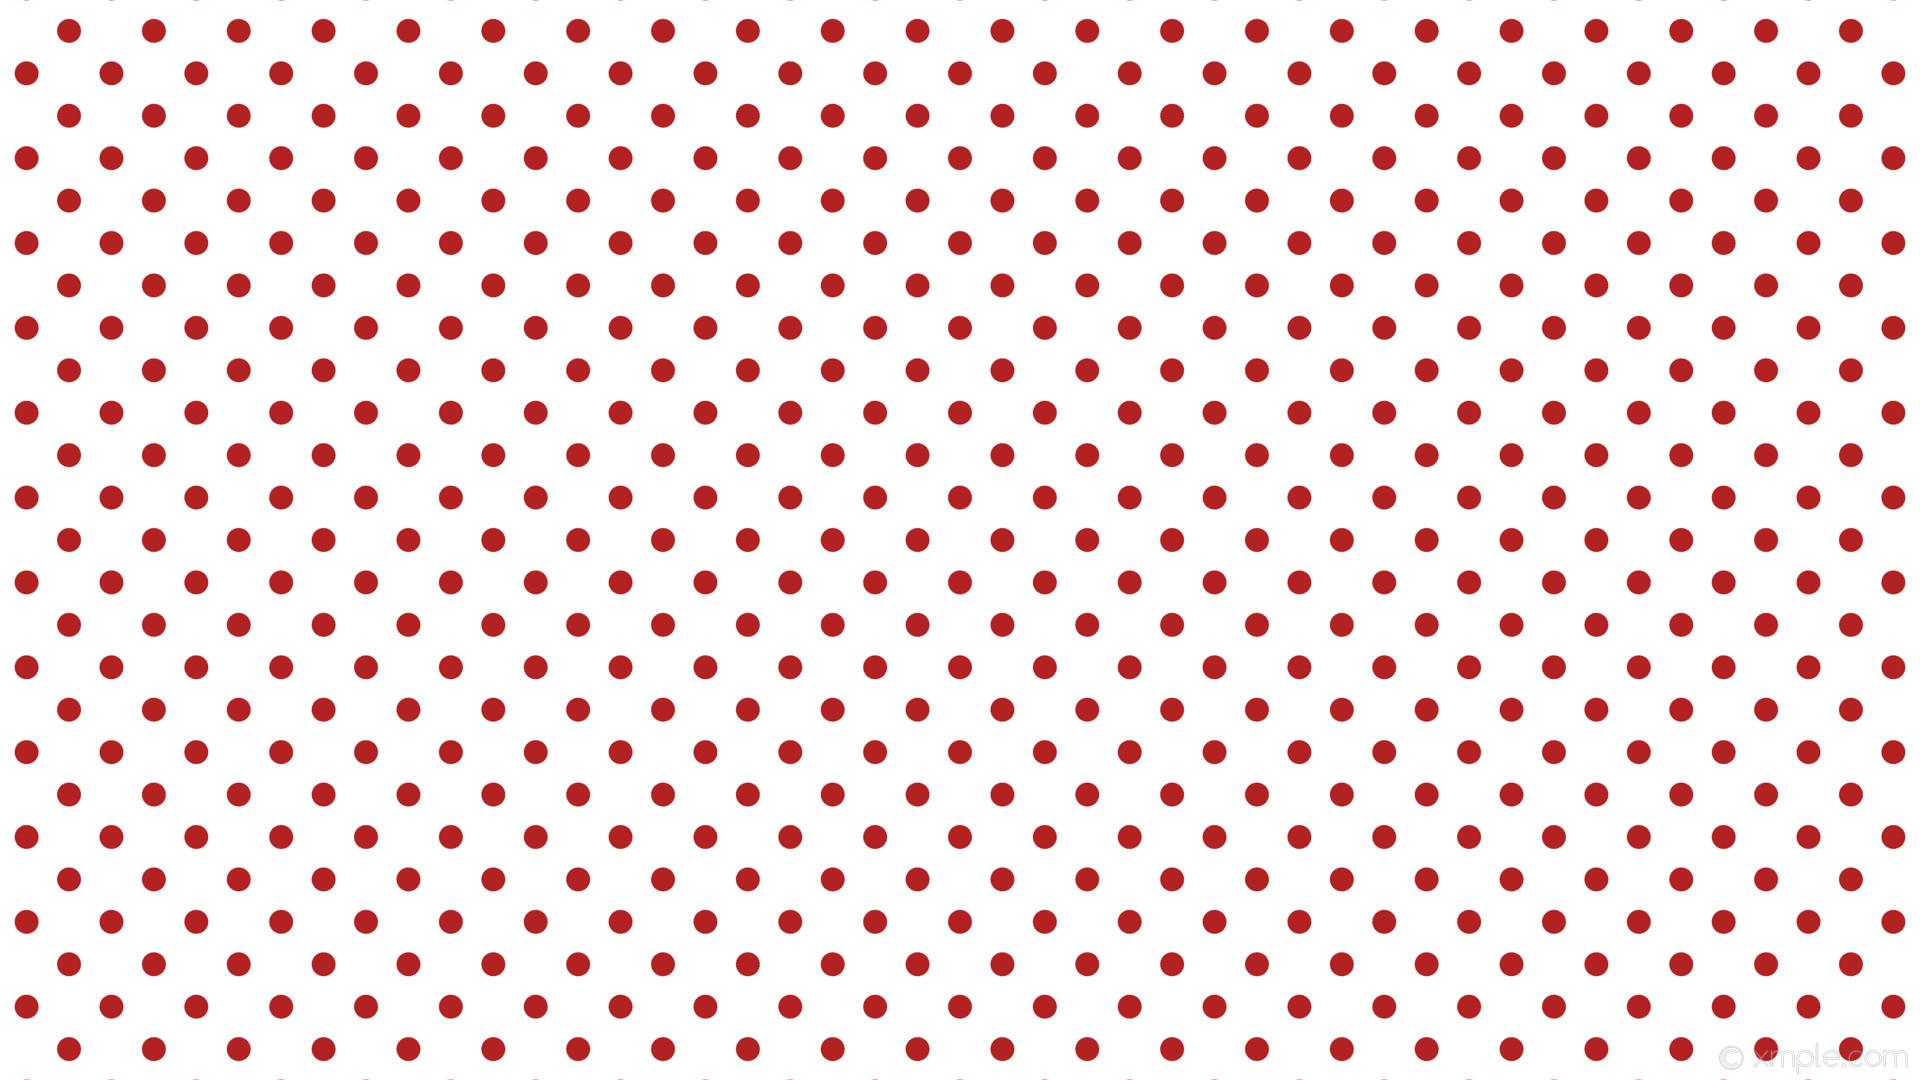 wallpaper white red dots spots polka fire brick #ffffff #b22222 45° 24px  60px